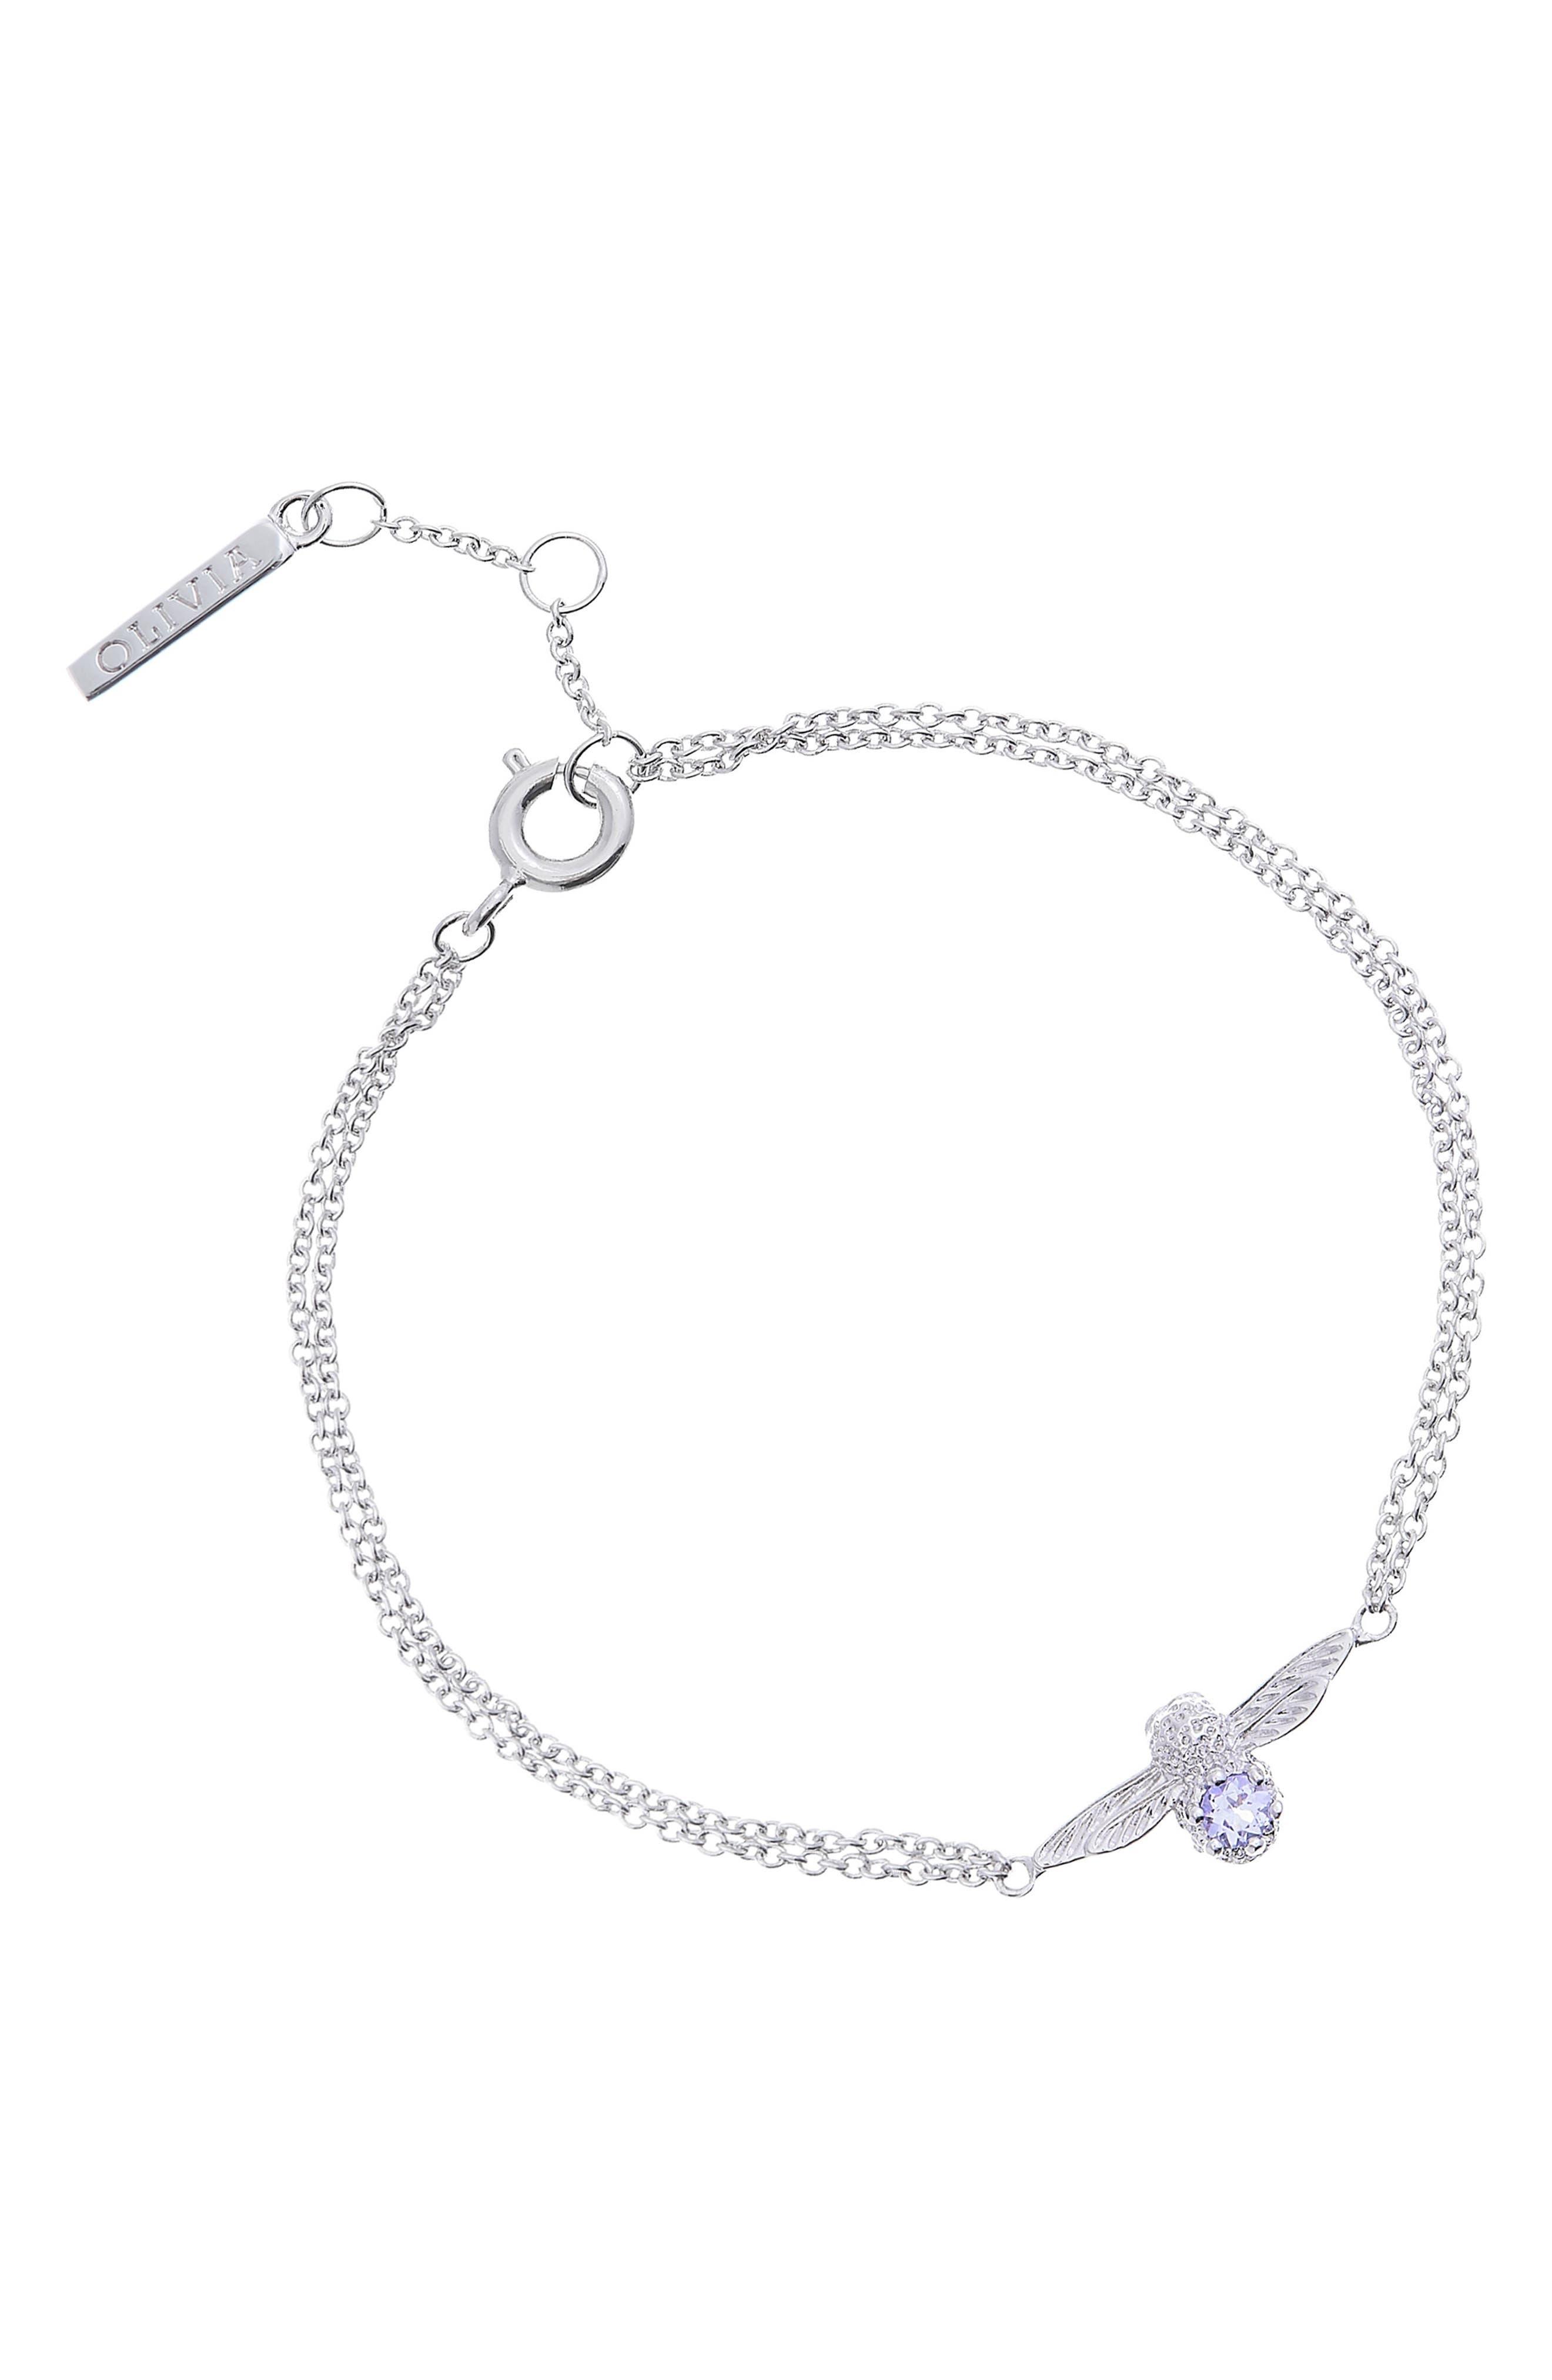 OLIVIA BURTON 3D Bejeweled Bee Bracelet, Main, color, TWO TONE-SILVER / TANZANITE